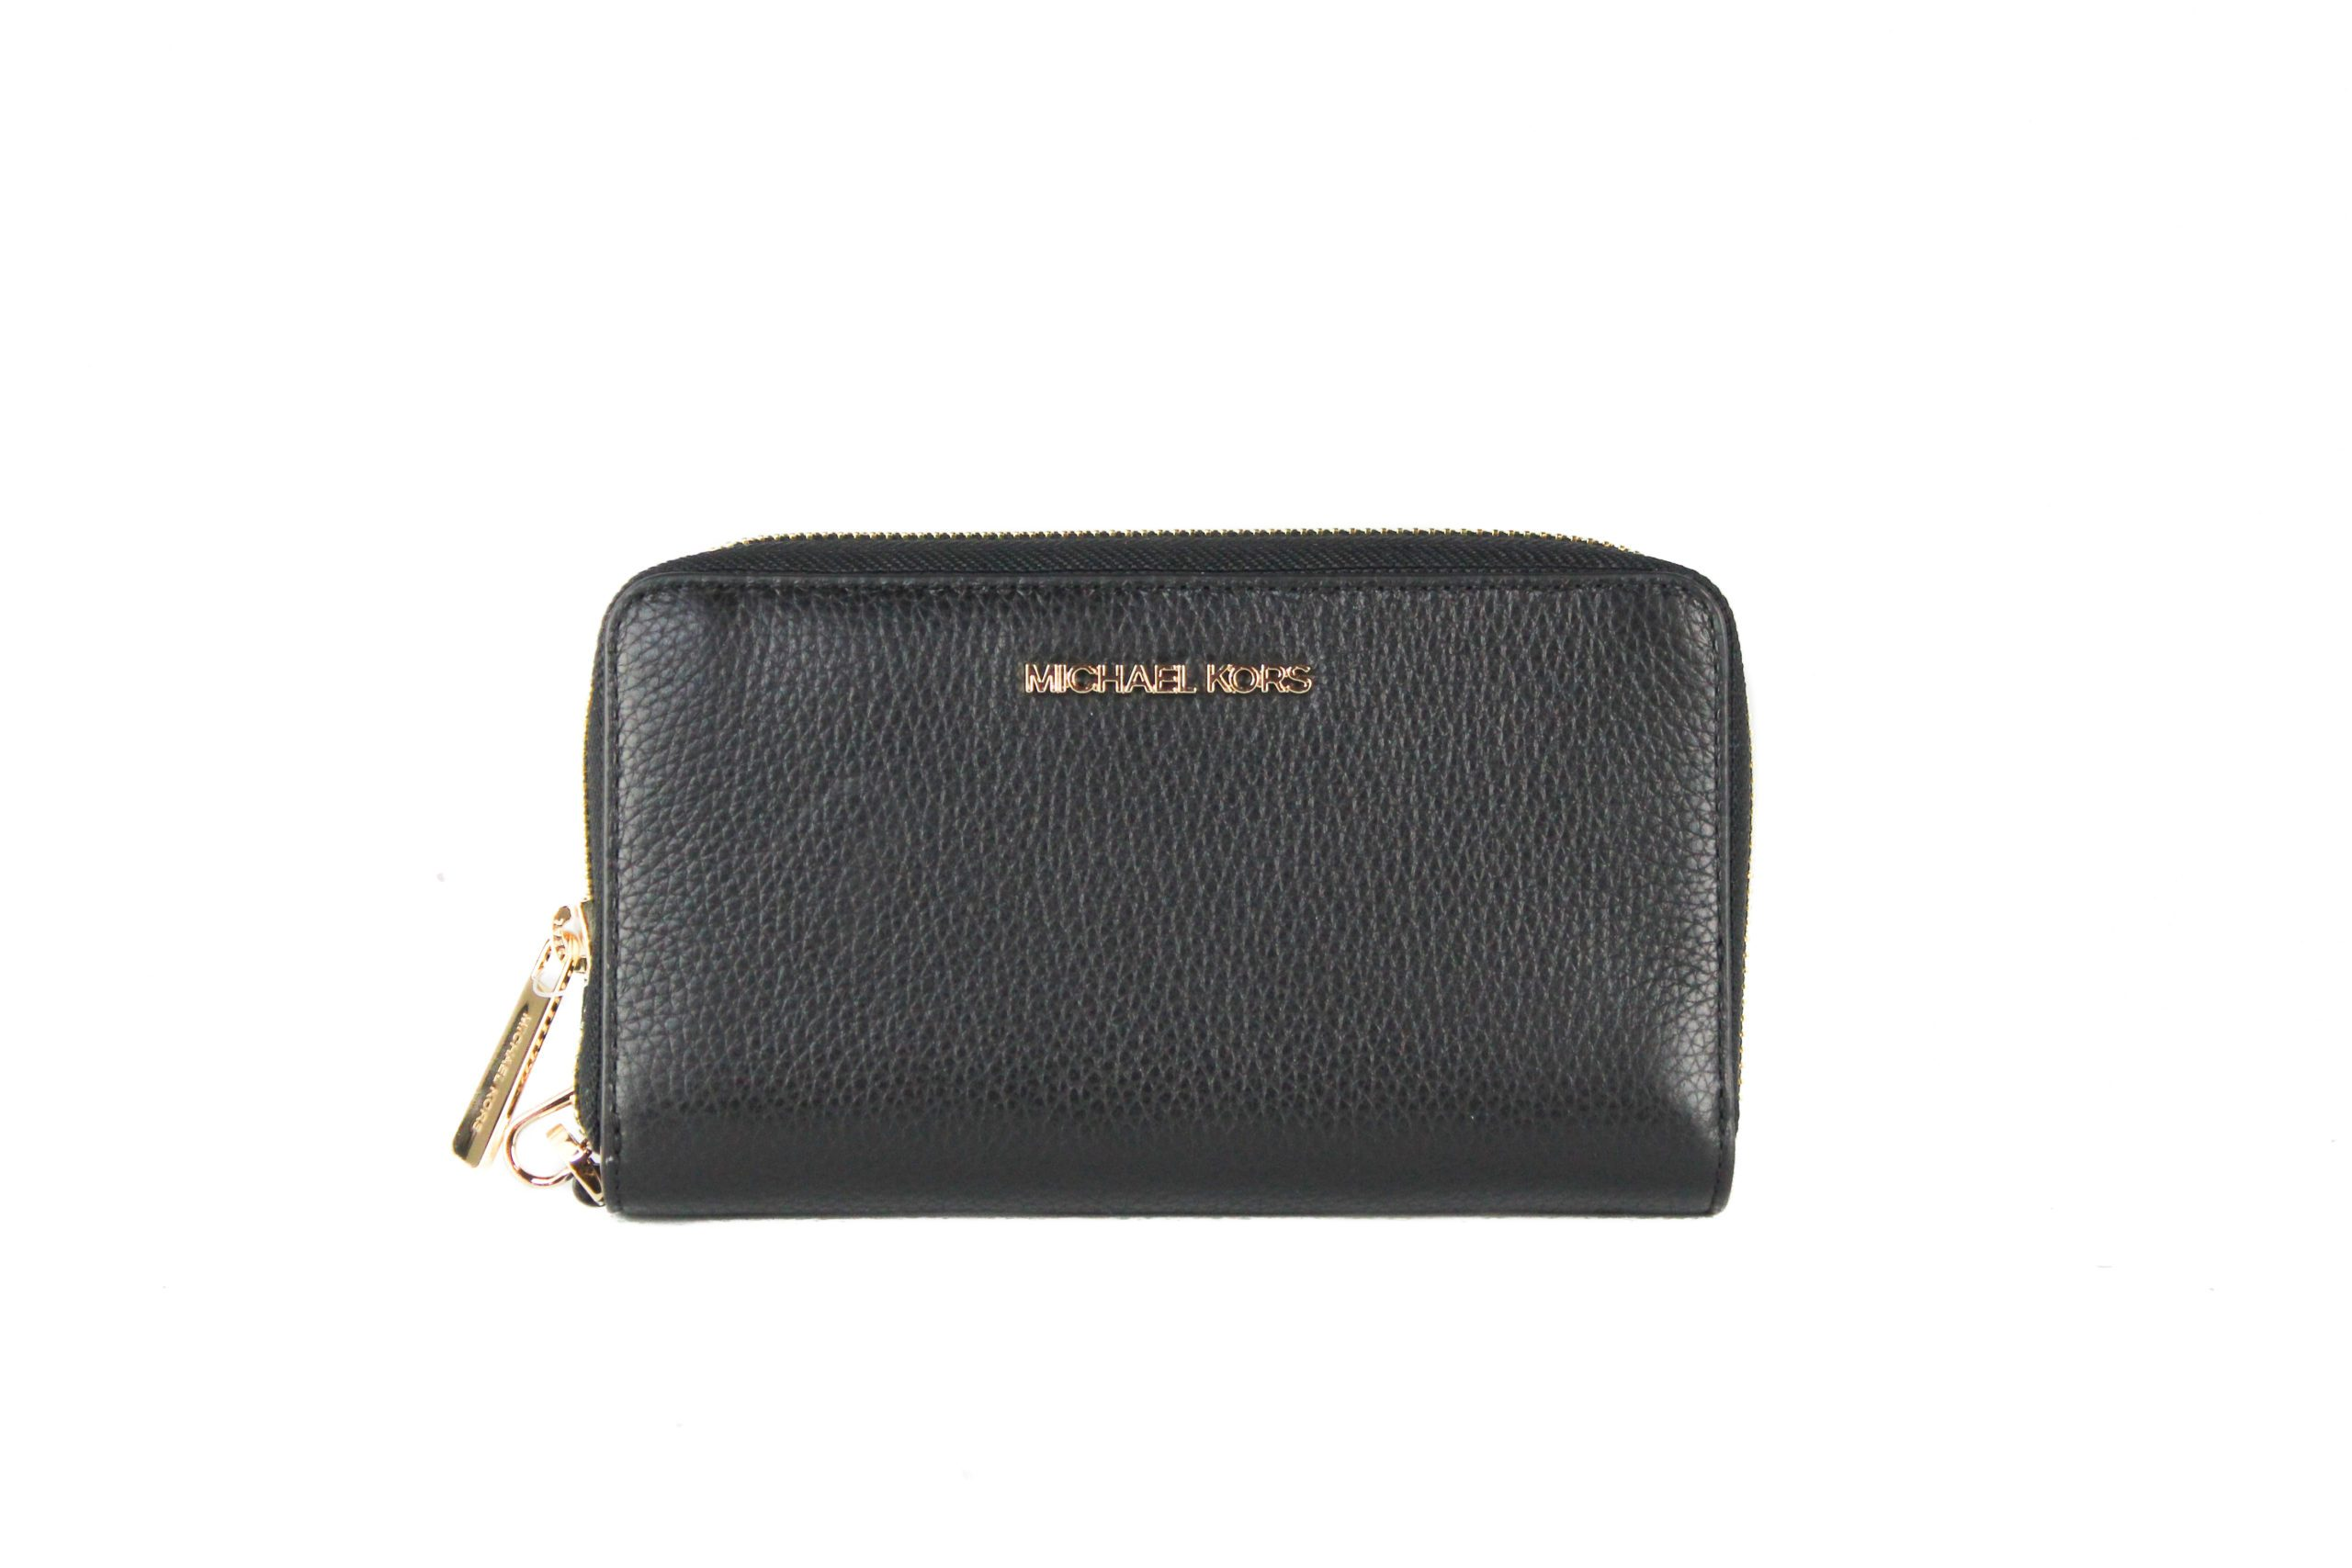 Michael Kors Women's Jet Set Wallet Black 39588